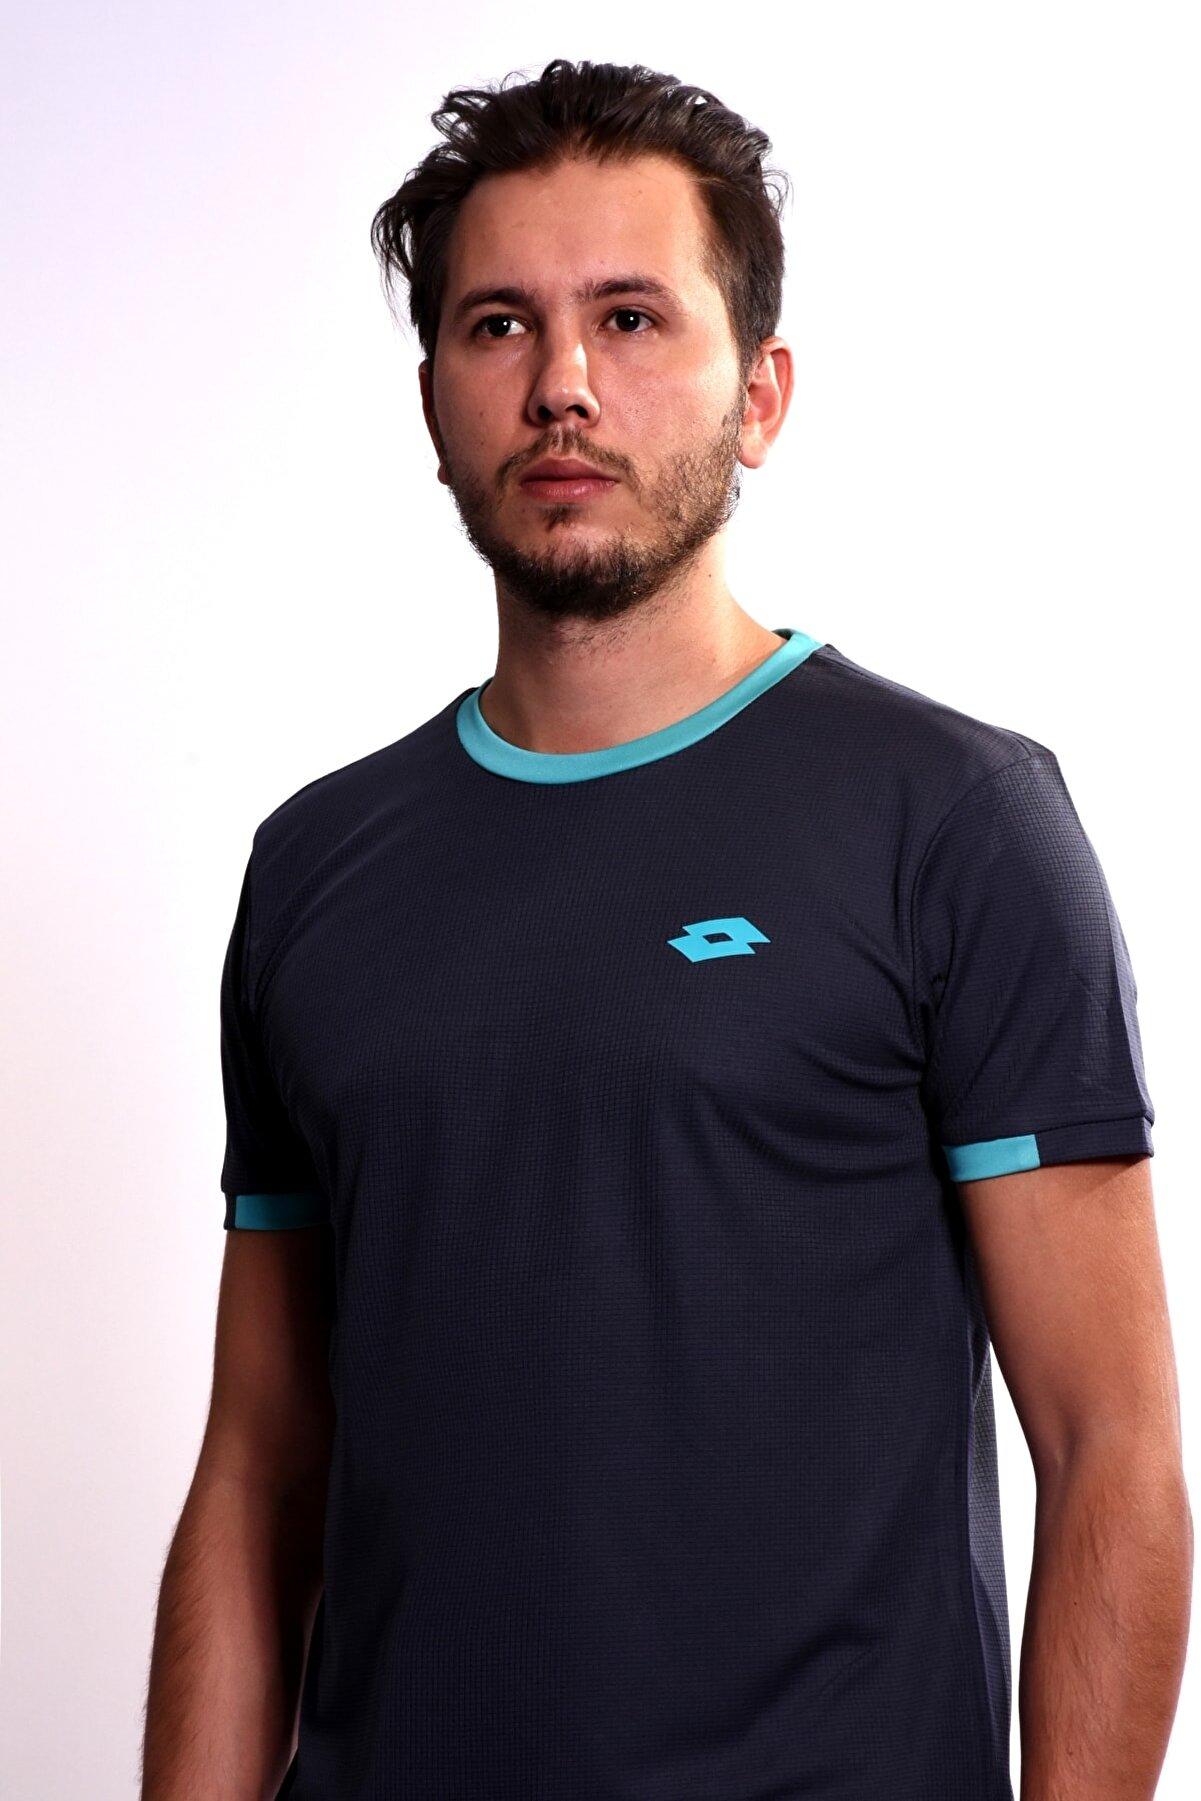 Lotto Erkek Spor T-Shirt - R3693